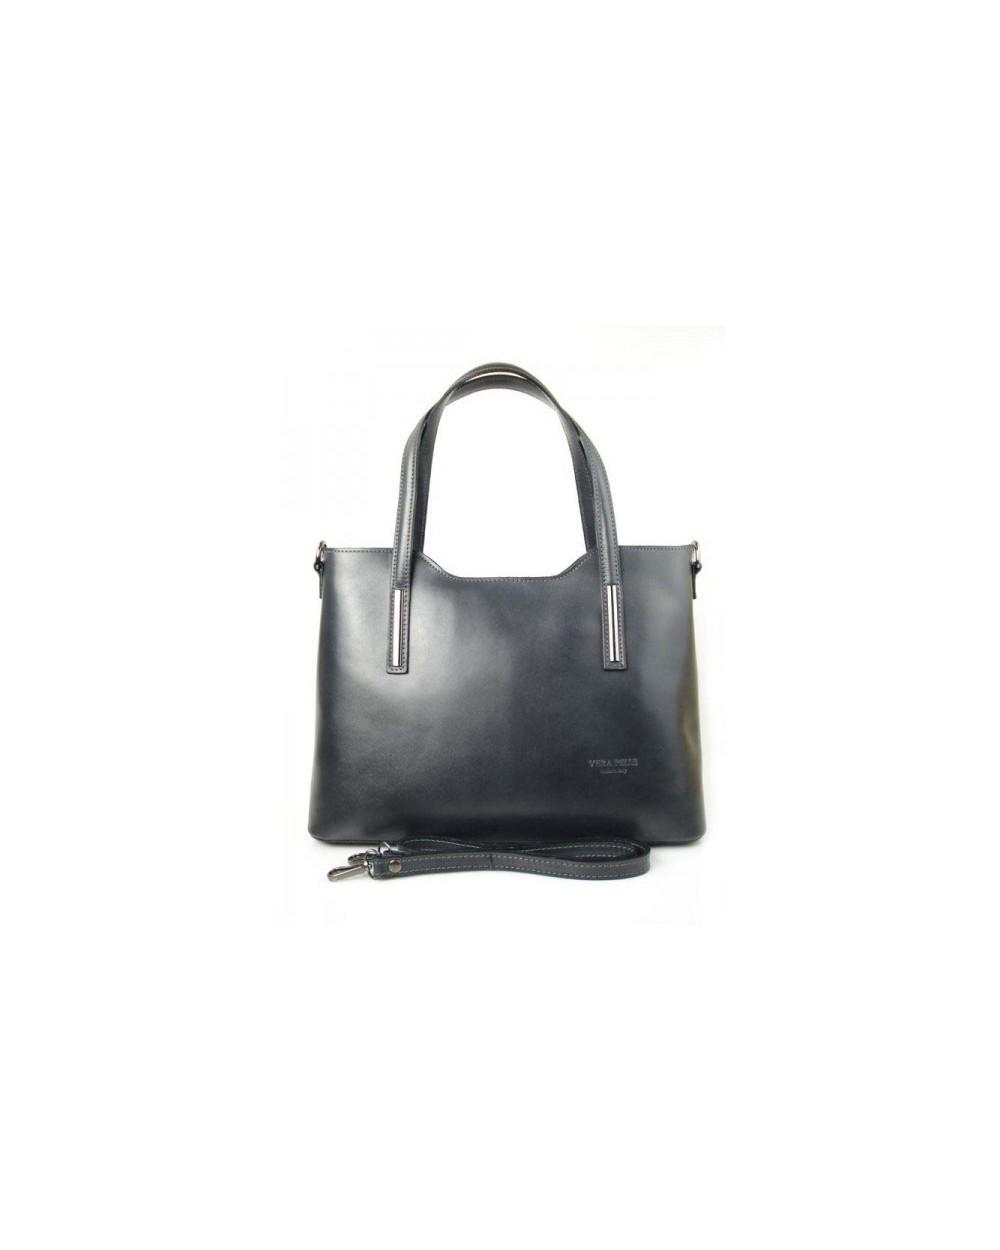 8999ccc386fee Klasyczna elegancka włoska torebka skórzana vera pelle Grafitowa. ‹ ›